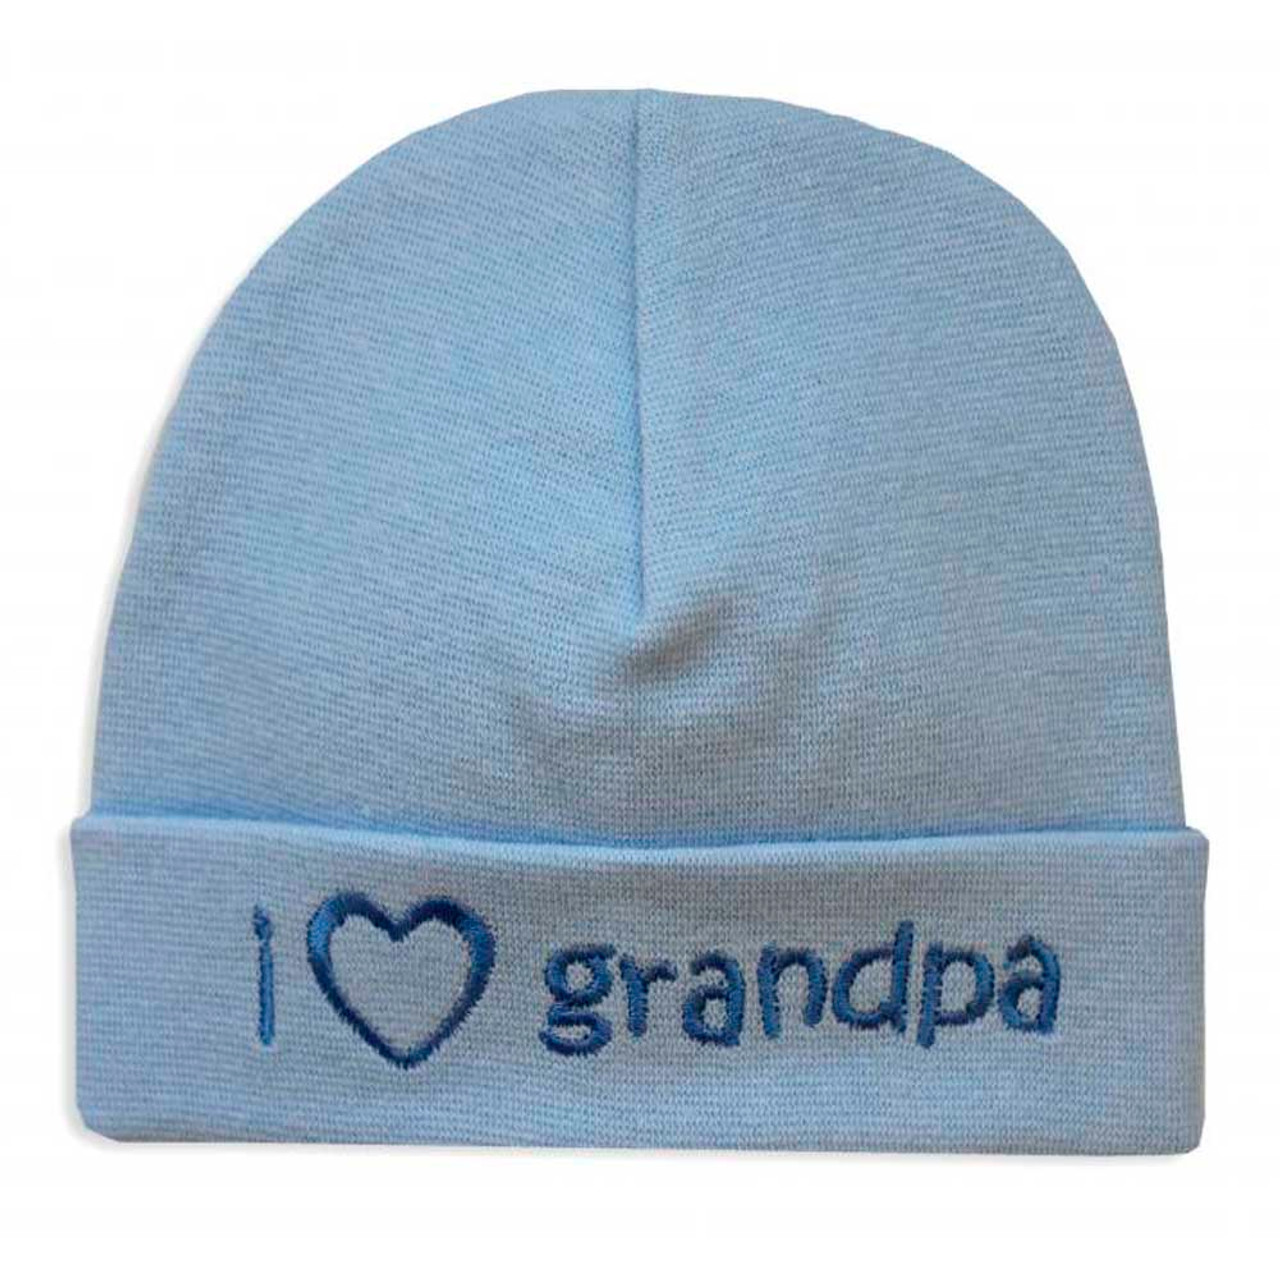 6b94f3cb199b Itty Bitty Baby Embroidered Toque - I Love Grandpa Blue (PR) - Dear ...